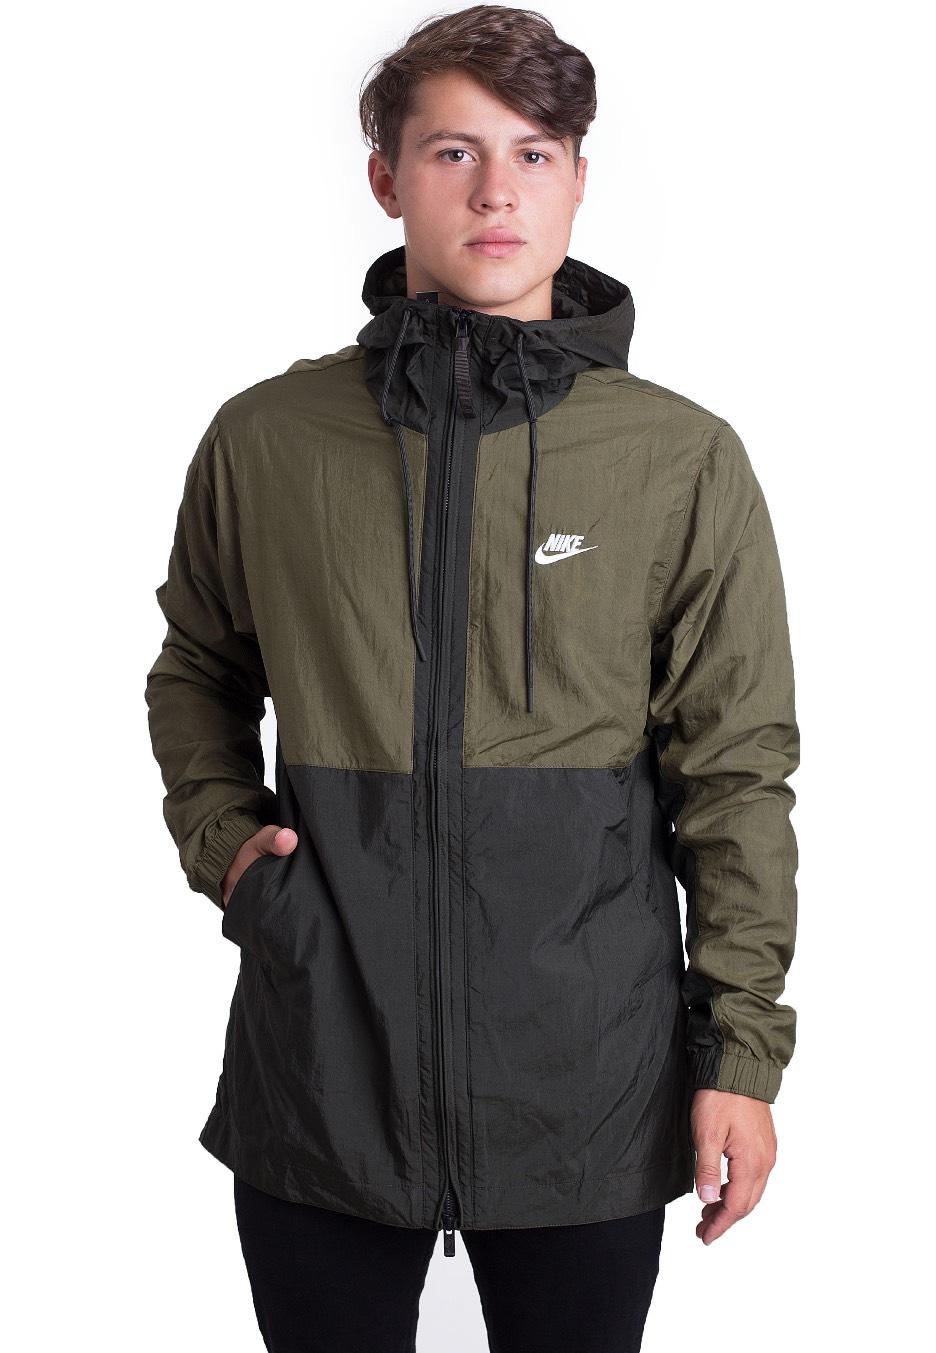 Nike - Sportswear Olive Canvas Sequoia White - Jacket - Streetwear Shop -  Impericon.com UK 26ddaf2b4f